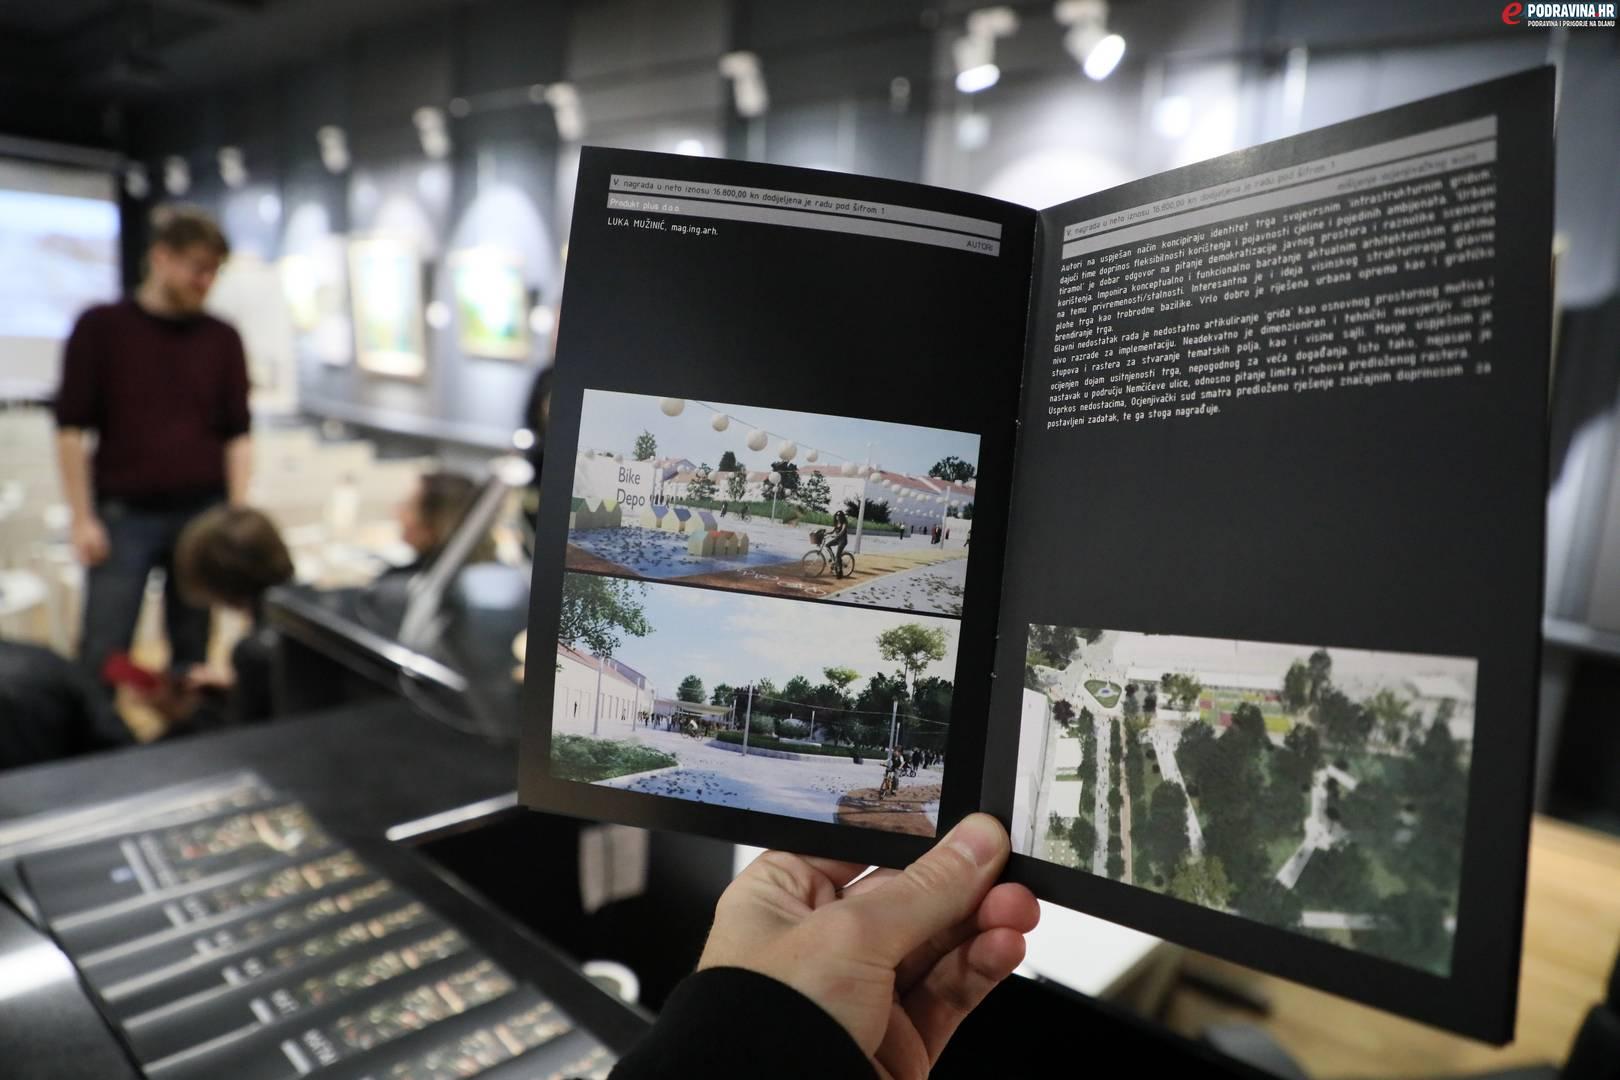 Natječajni radovi rekonstrukcije Zrinskog trga // Foto: Matija Gudlin